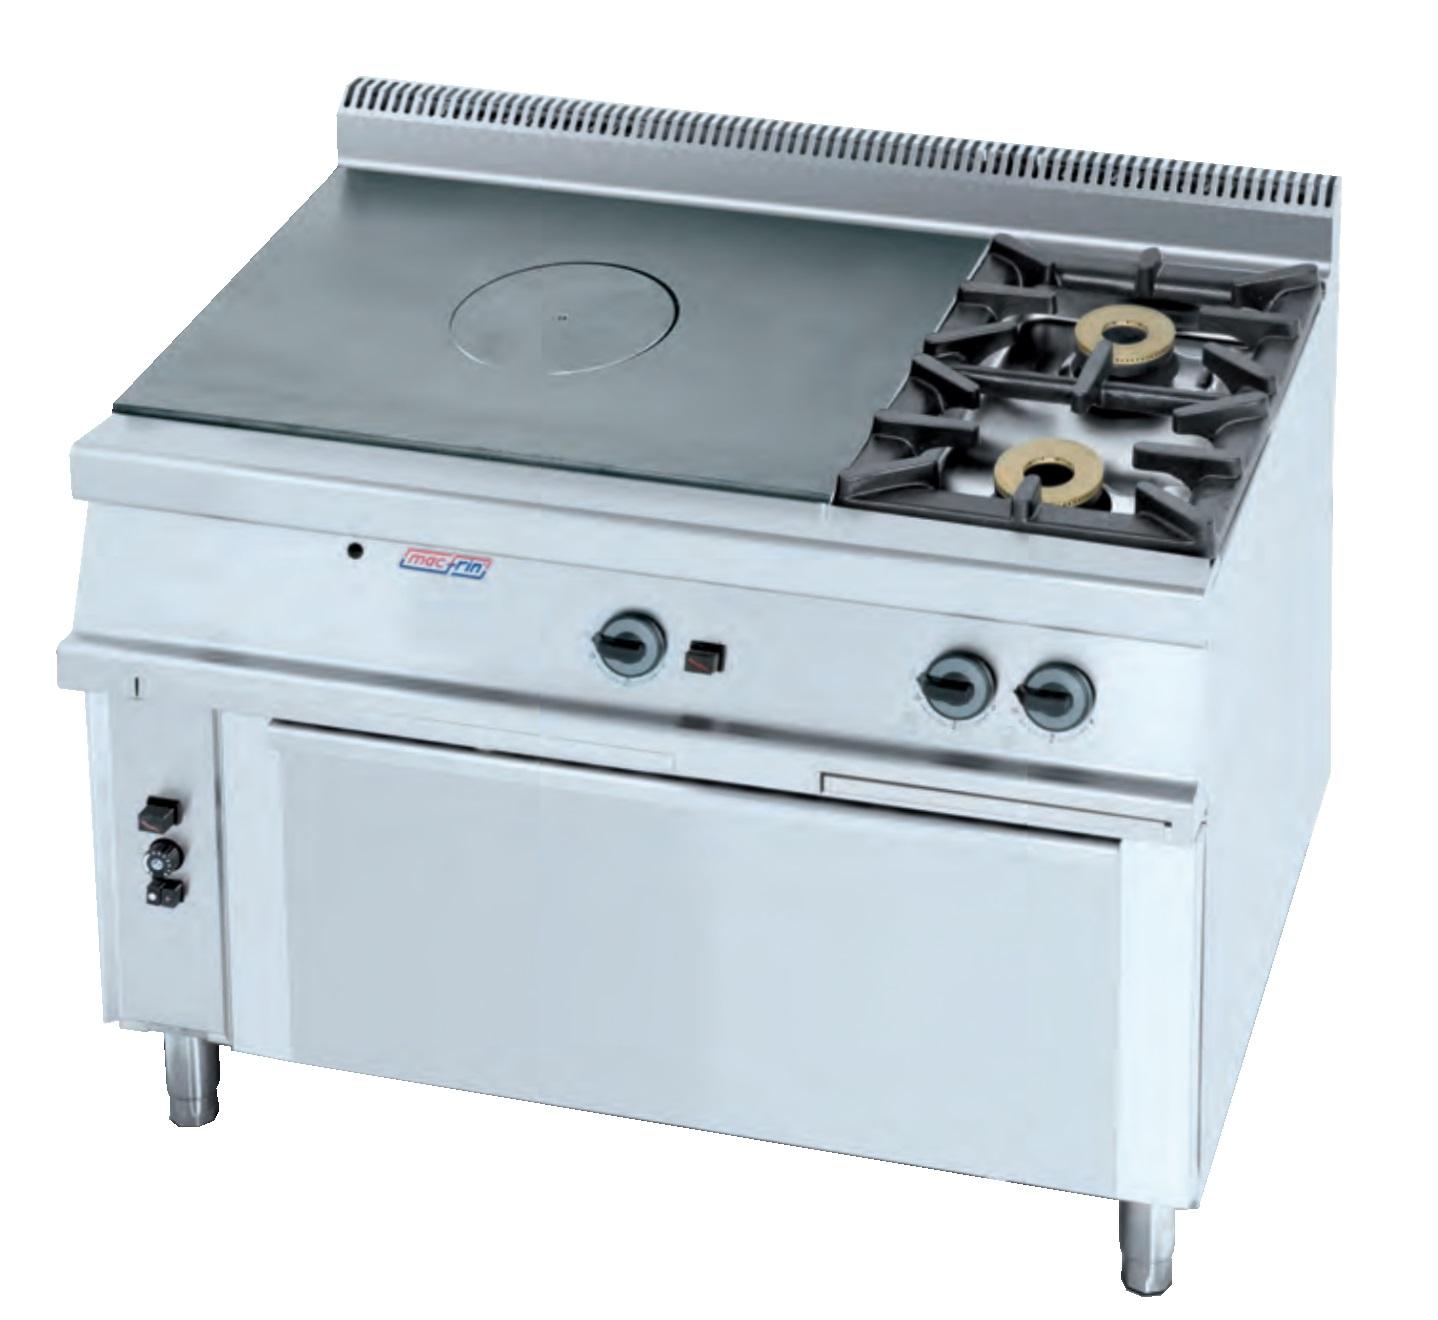 Cocci n cocina plancha a gas eurast 5011 3 fuegos - Plancha para cocina de gas ...